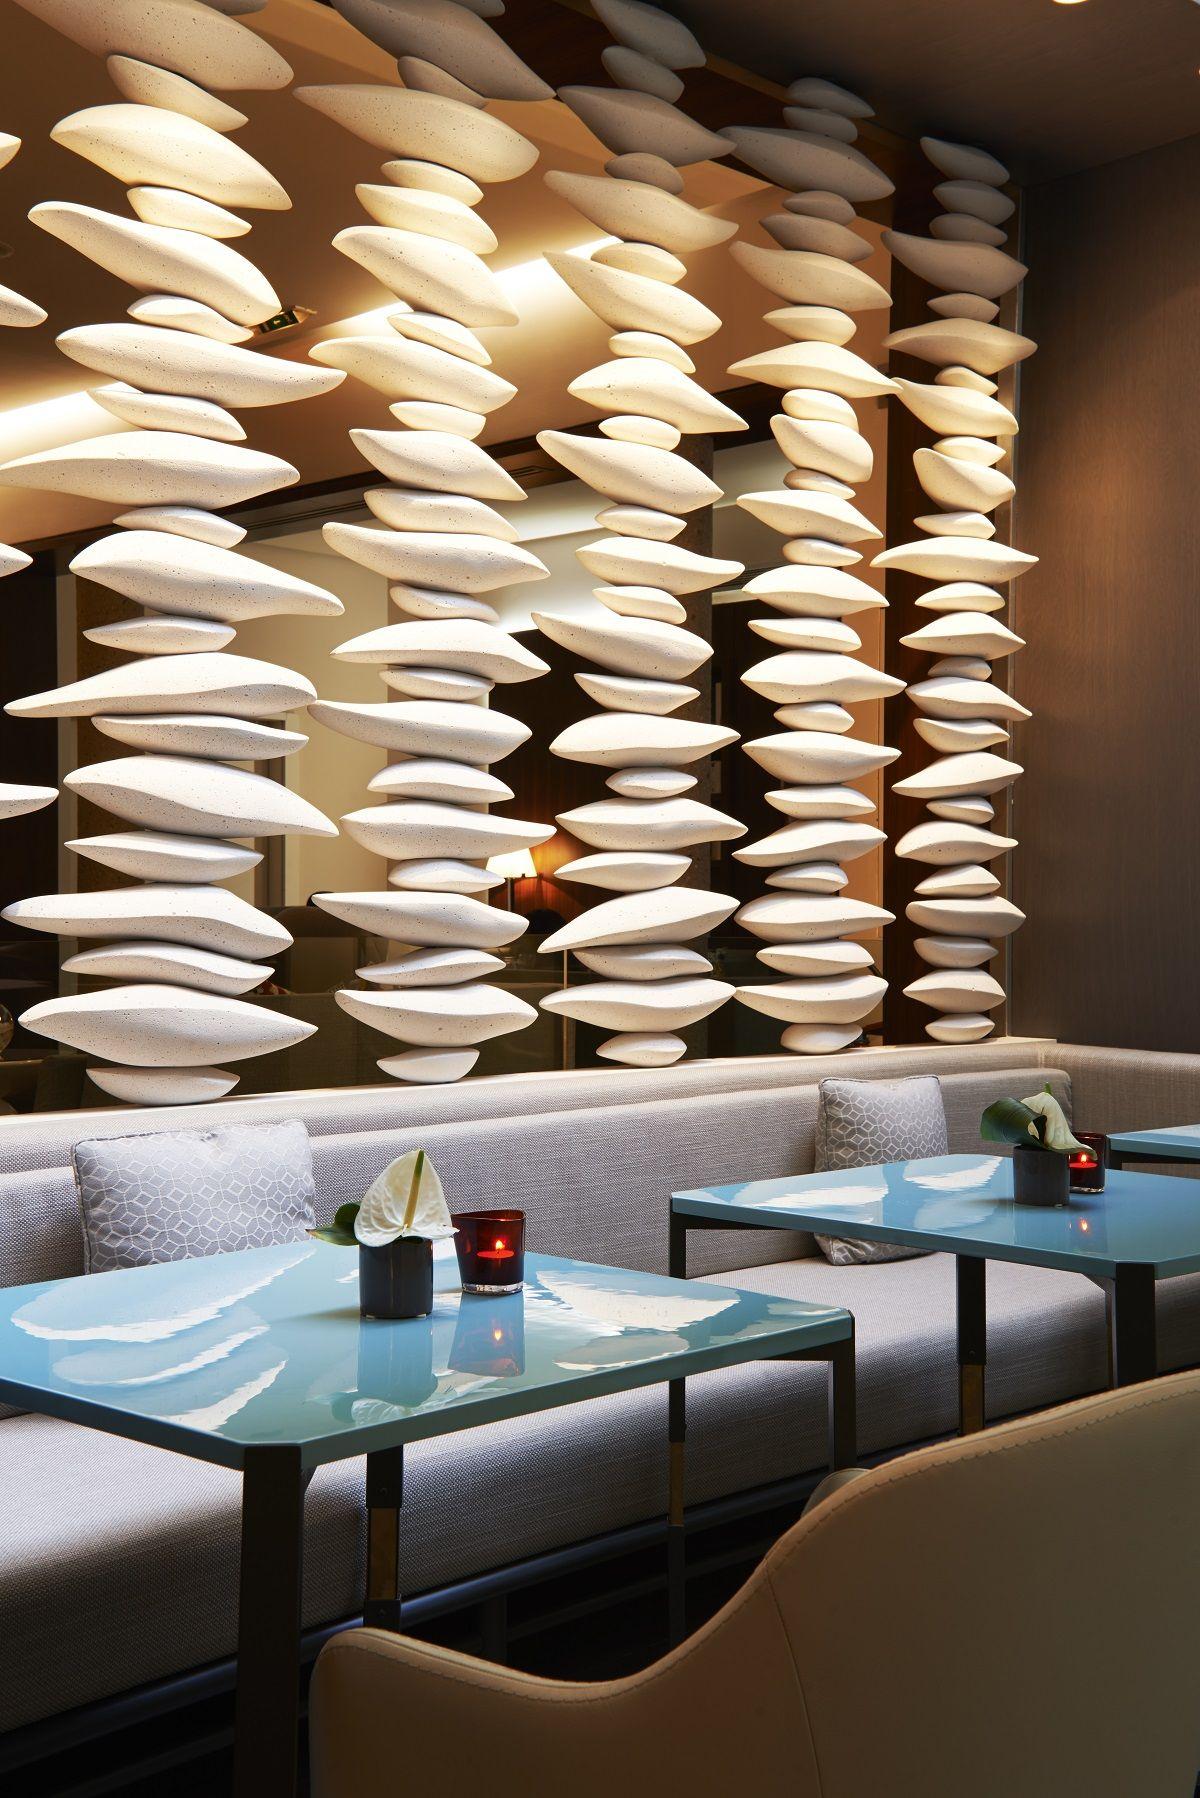 Hotel de Sers - Paris, France A 5-star design... | Restaurant ...